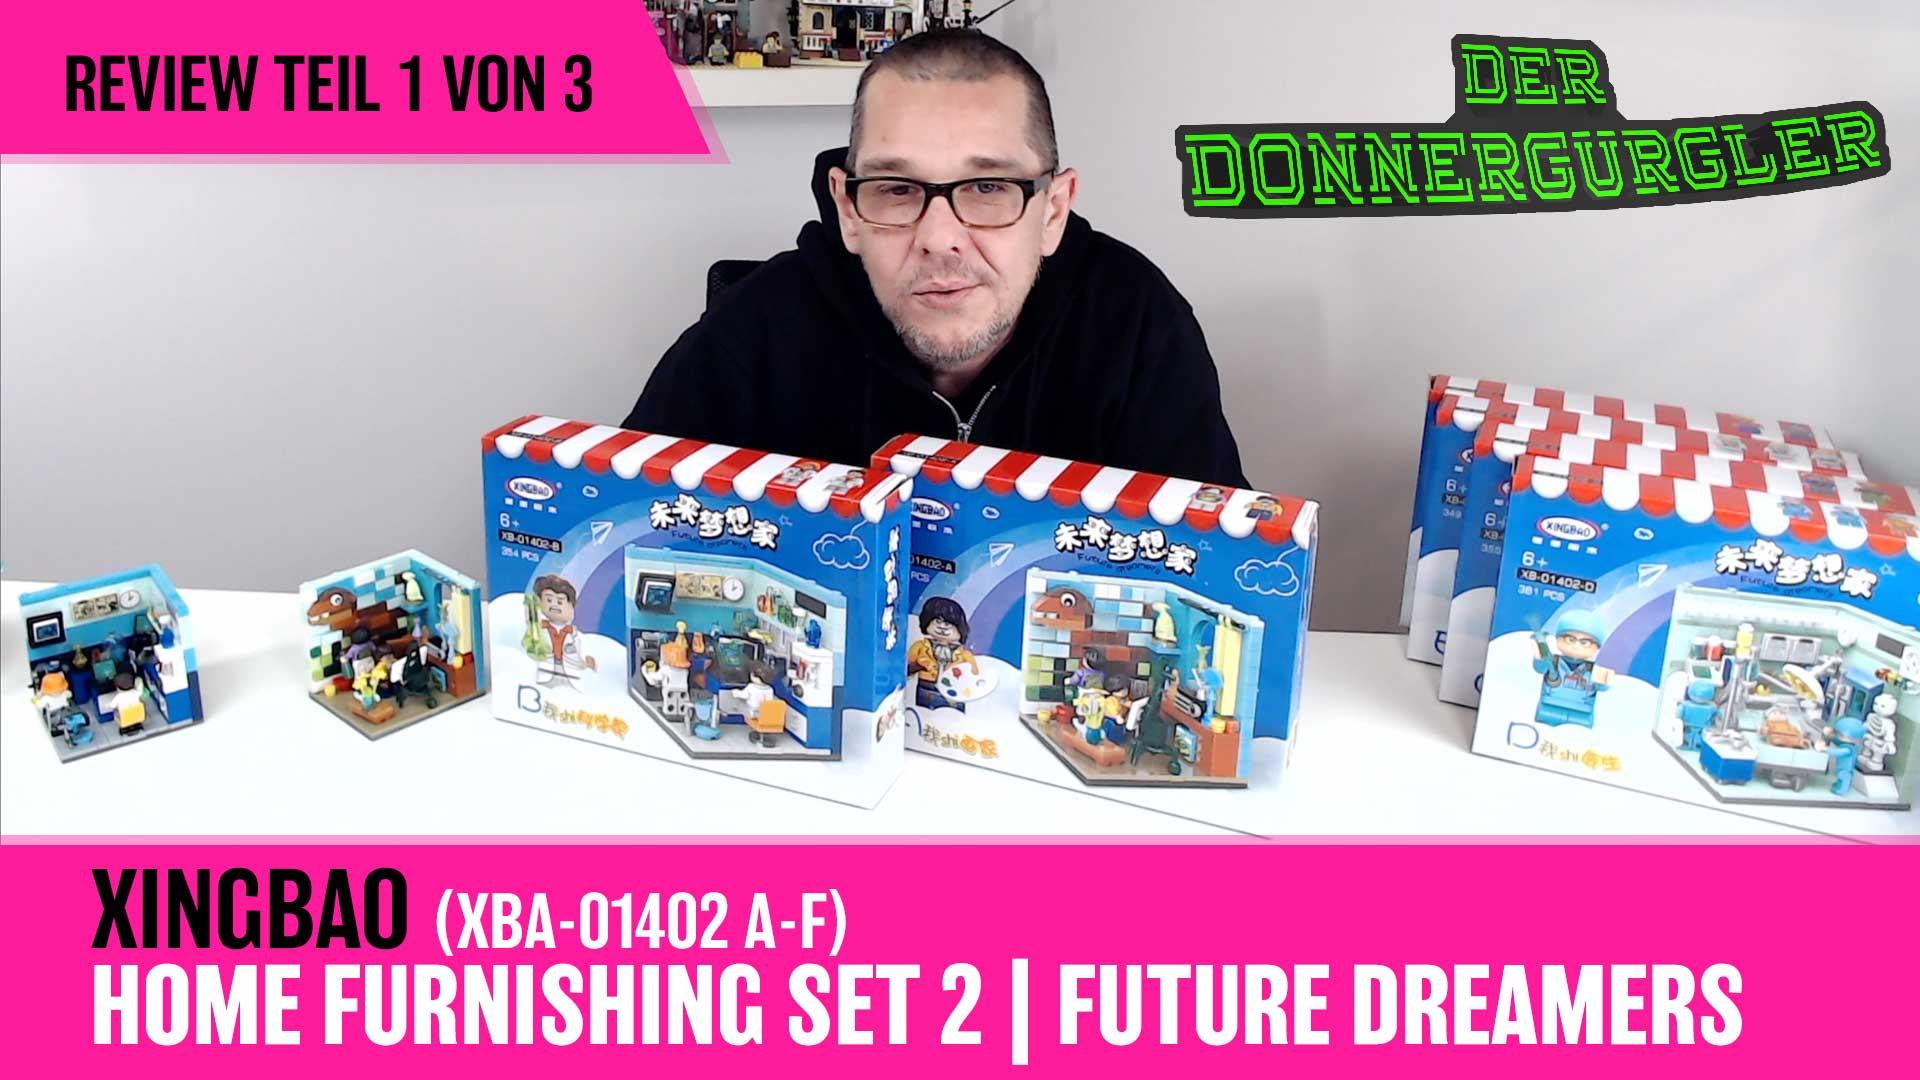 Xingbao Home Furnishing Set 2 - Future Dreamers Kompletset XBA-01402A-F Teil 1v3